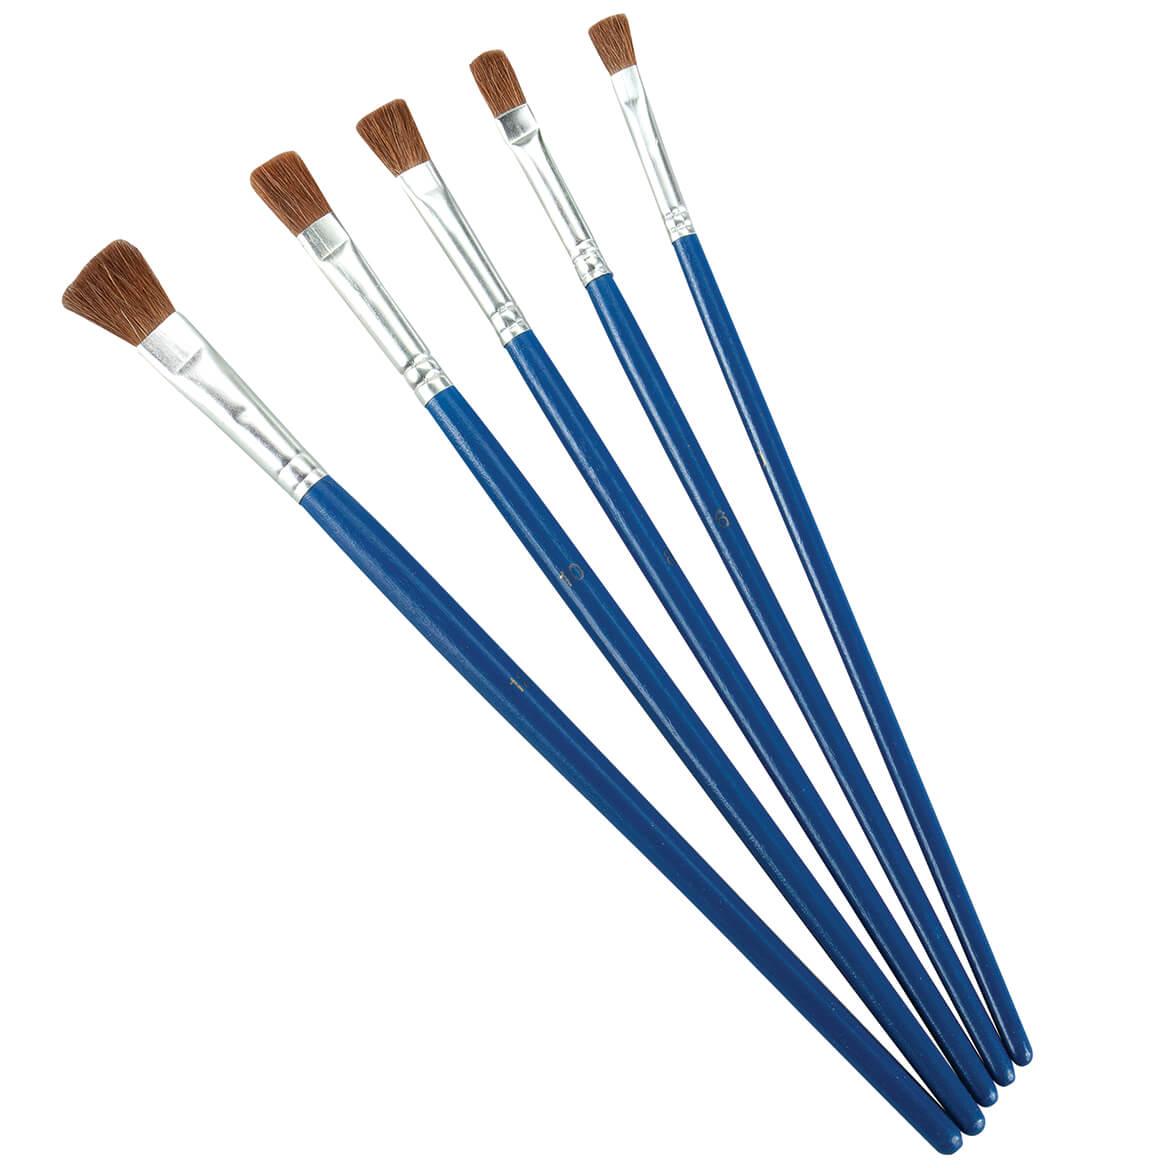 Craft Paint Brushes Set of 5-371533